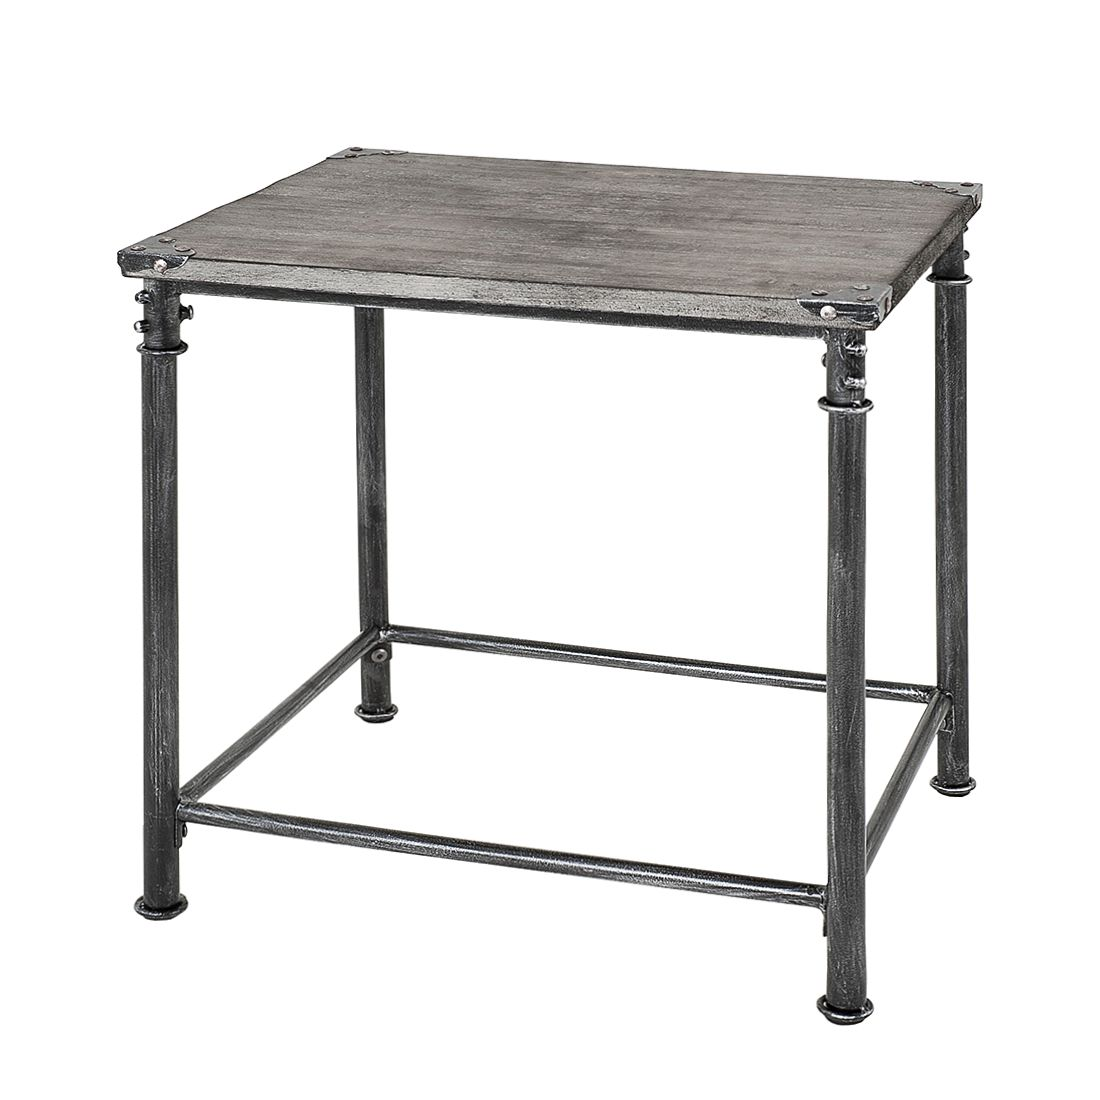 Tischplatte massivholz g nstig kaufen for Tischplatte massivholz